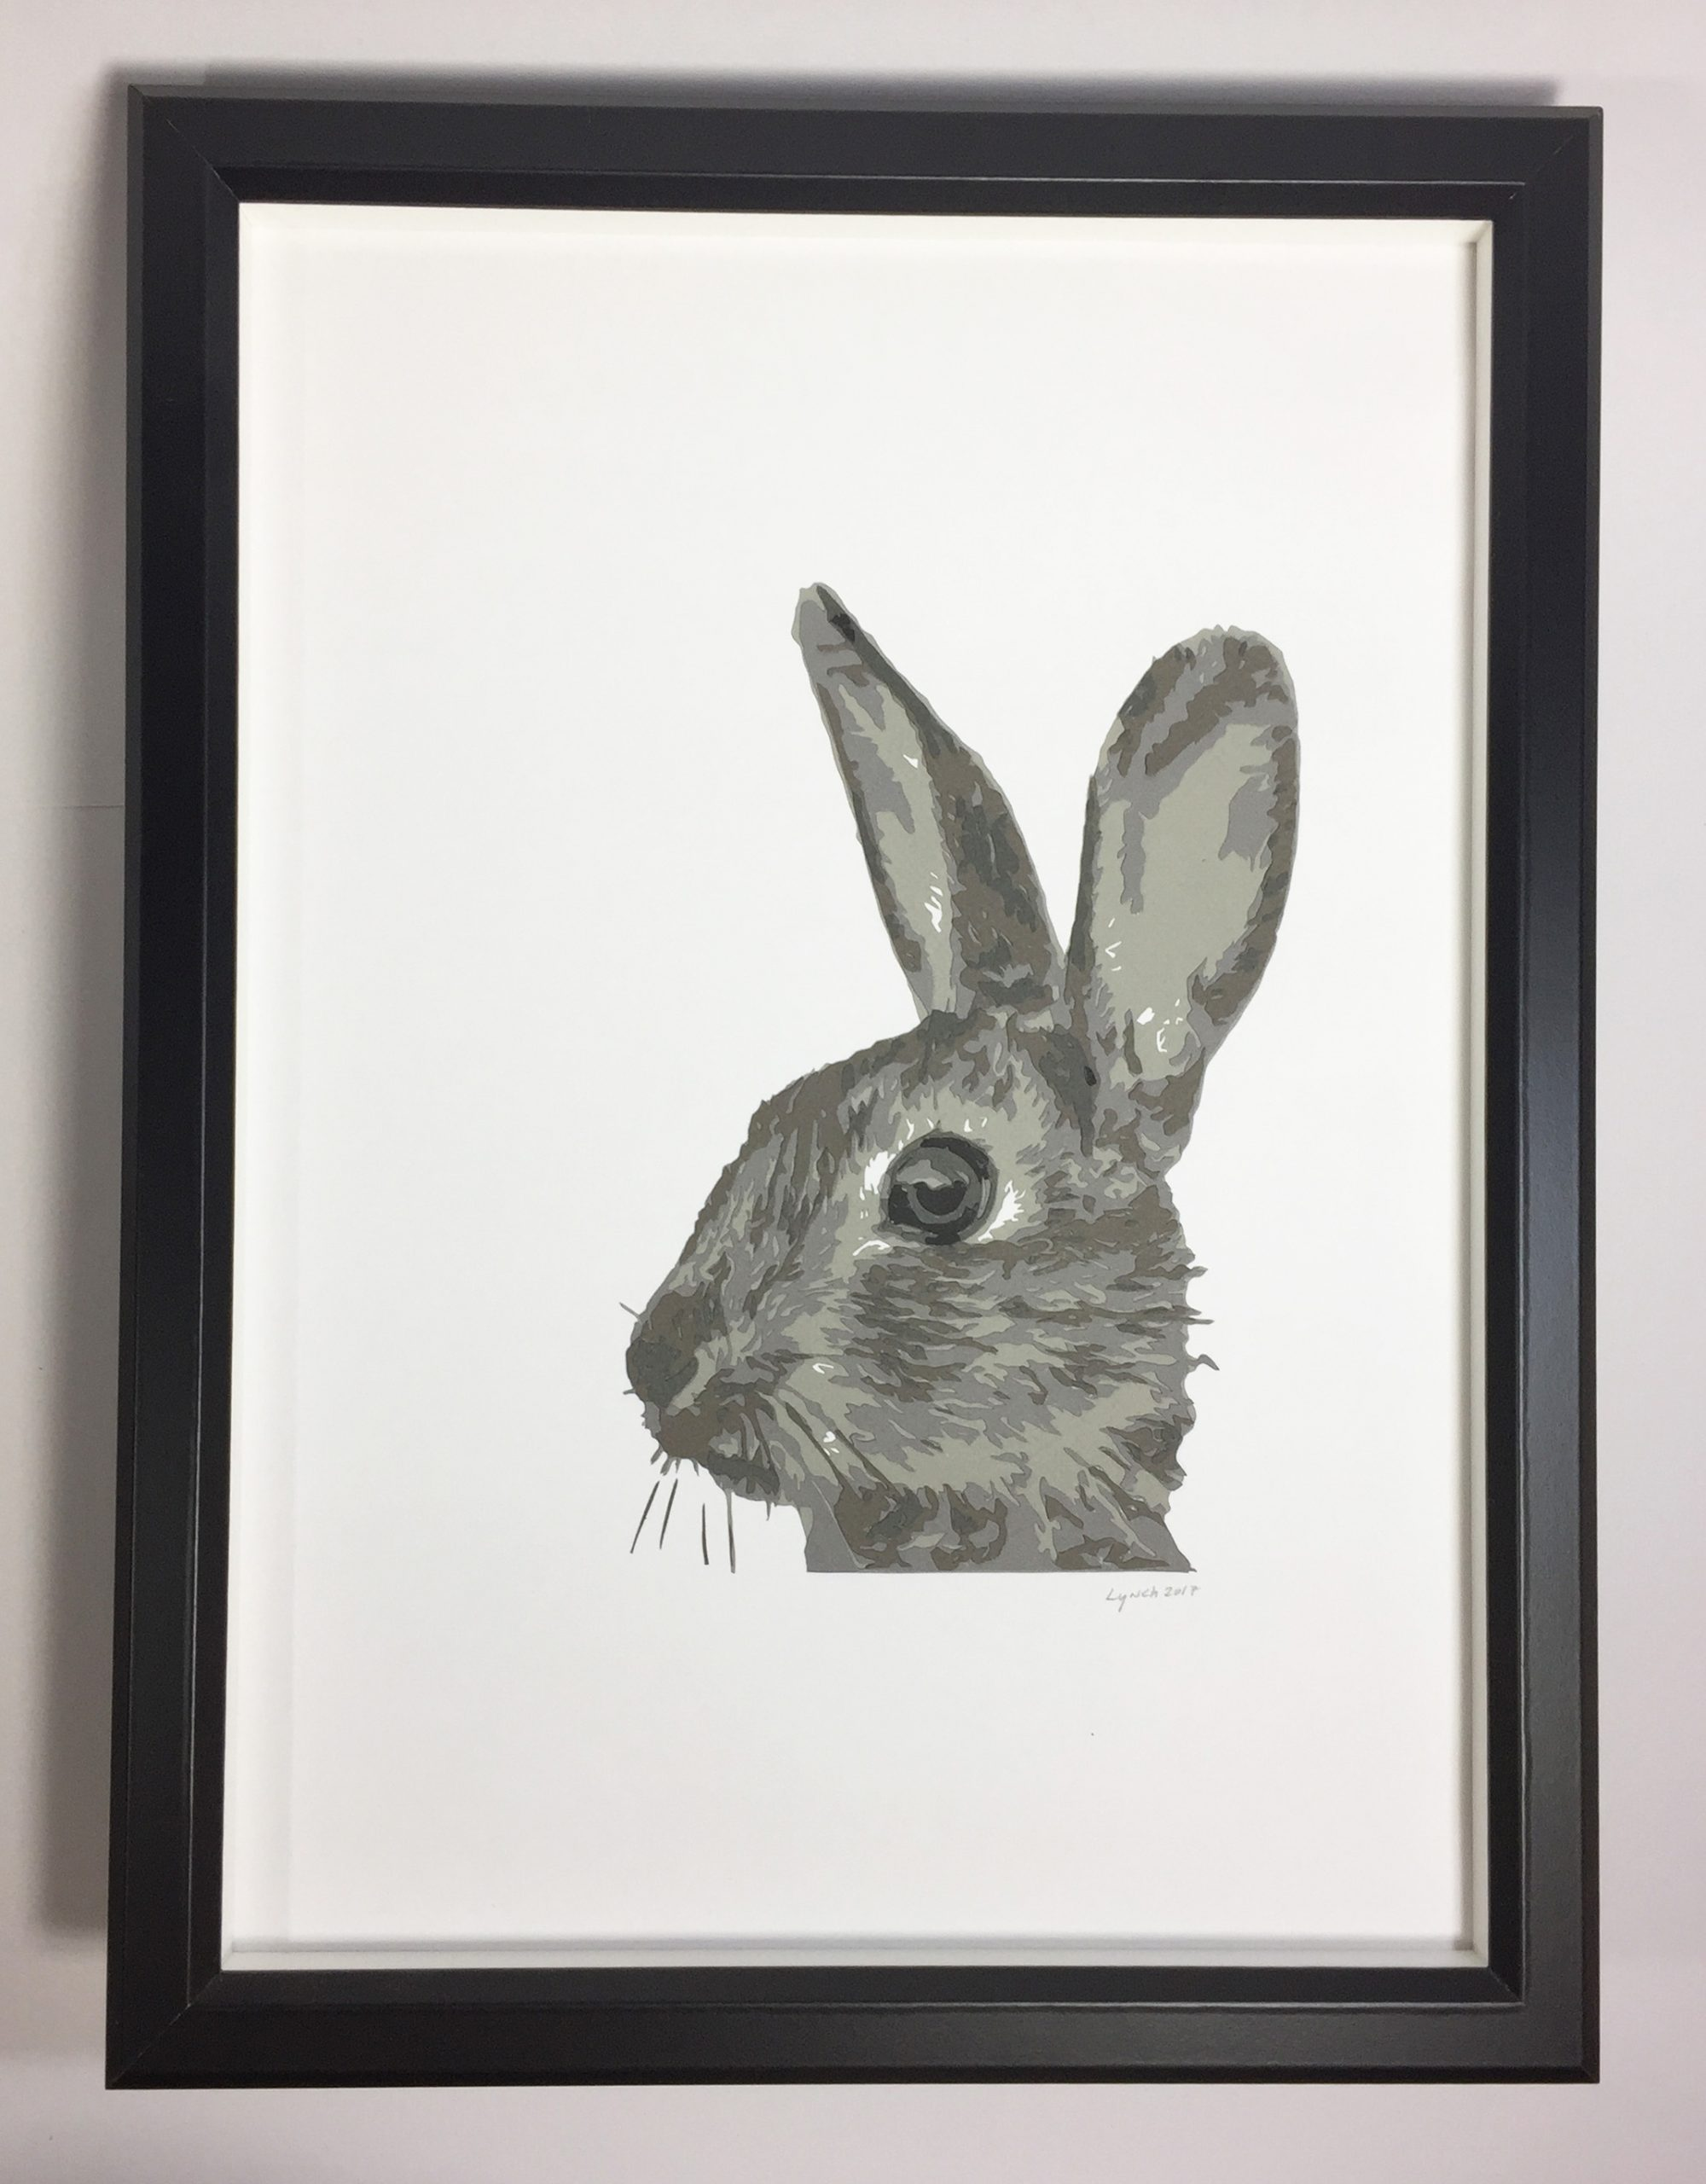 Showshoe Rabbit, layer 12×16